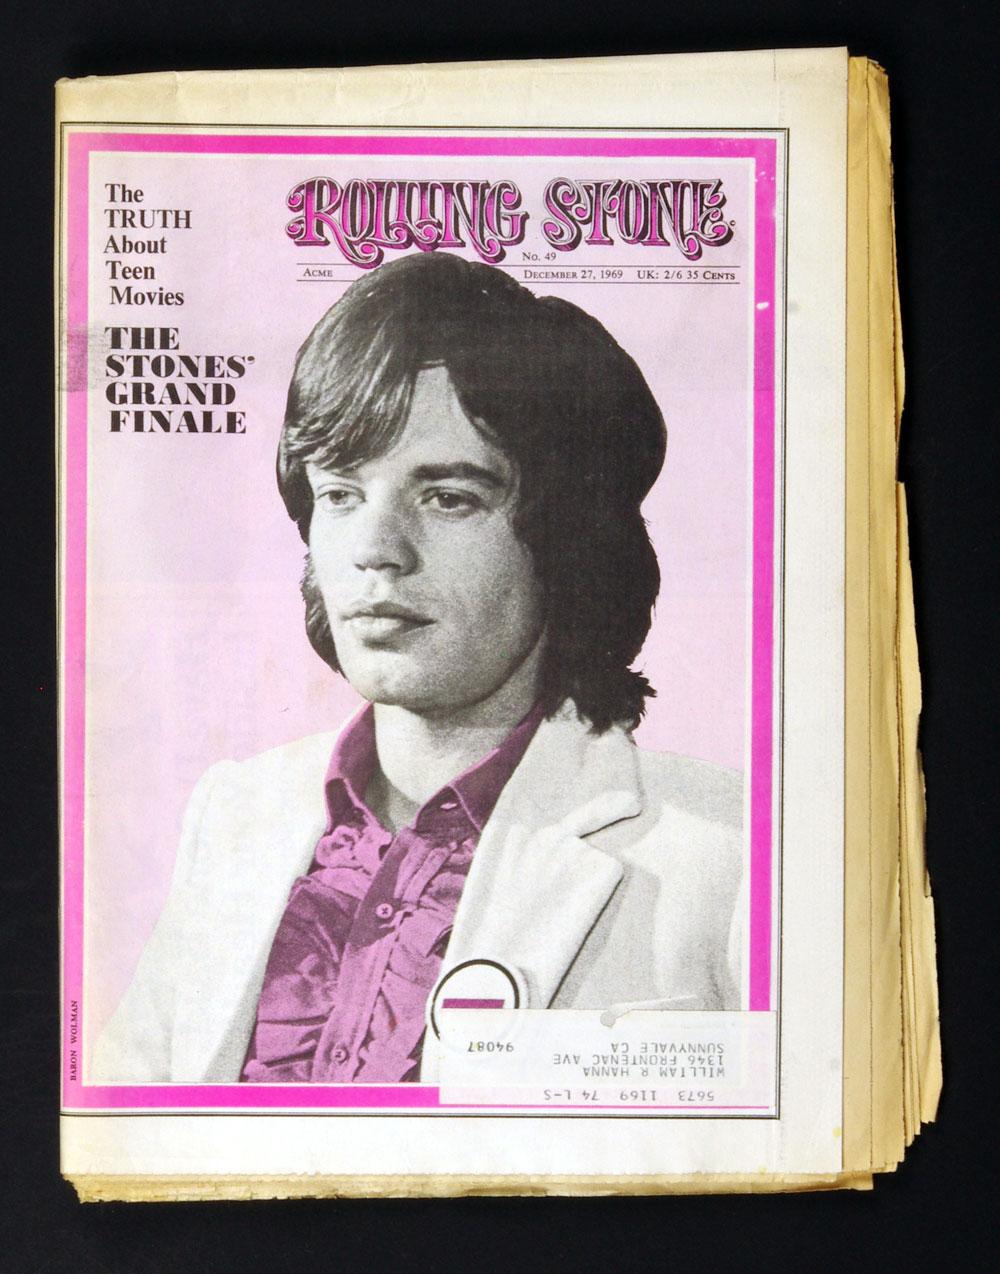 Rolling Stone Magazine 1969 Dec 27 No. 49 Mick Jagger